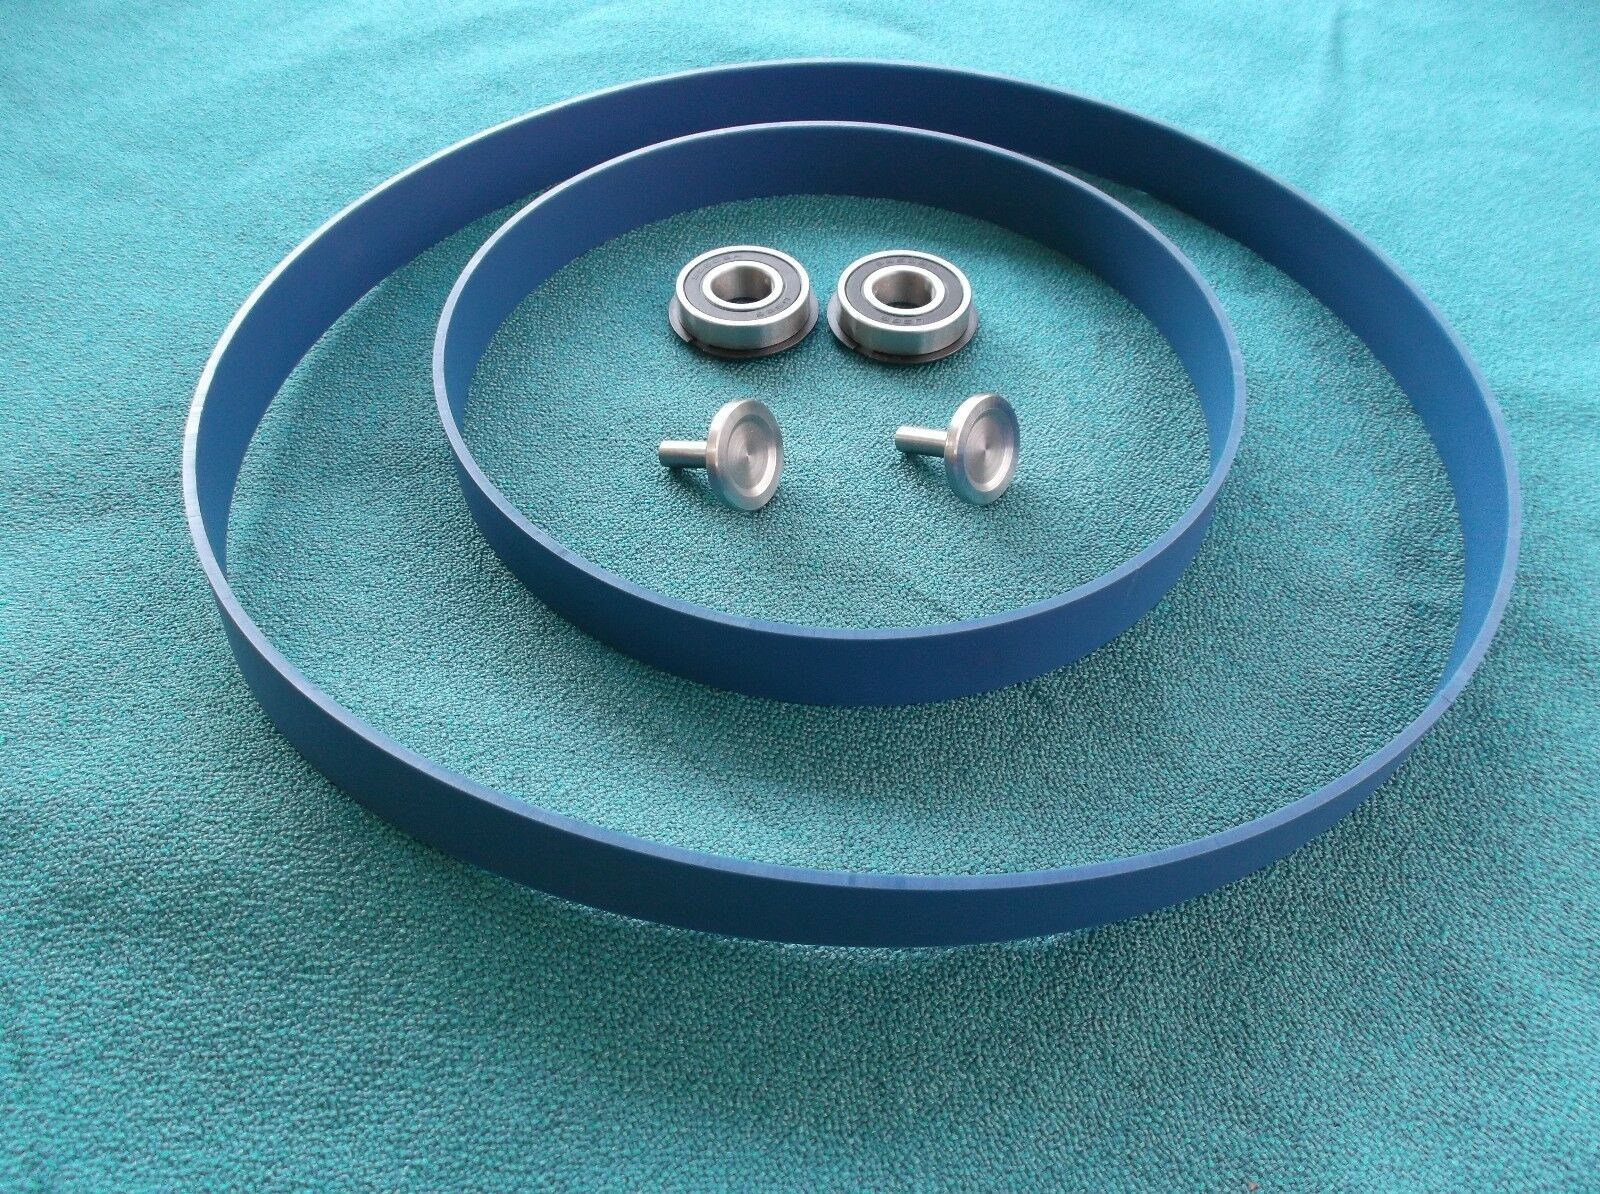 Blau MAX ULTRA BAND SAW TIRES / REBUILD KIT SEARS CRAFTSMAN 113.244421 BAND SAW